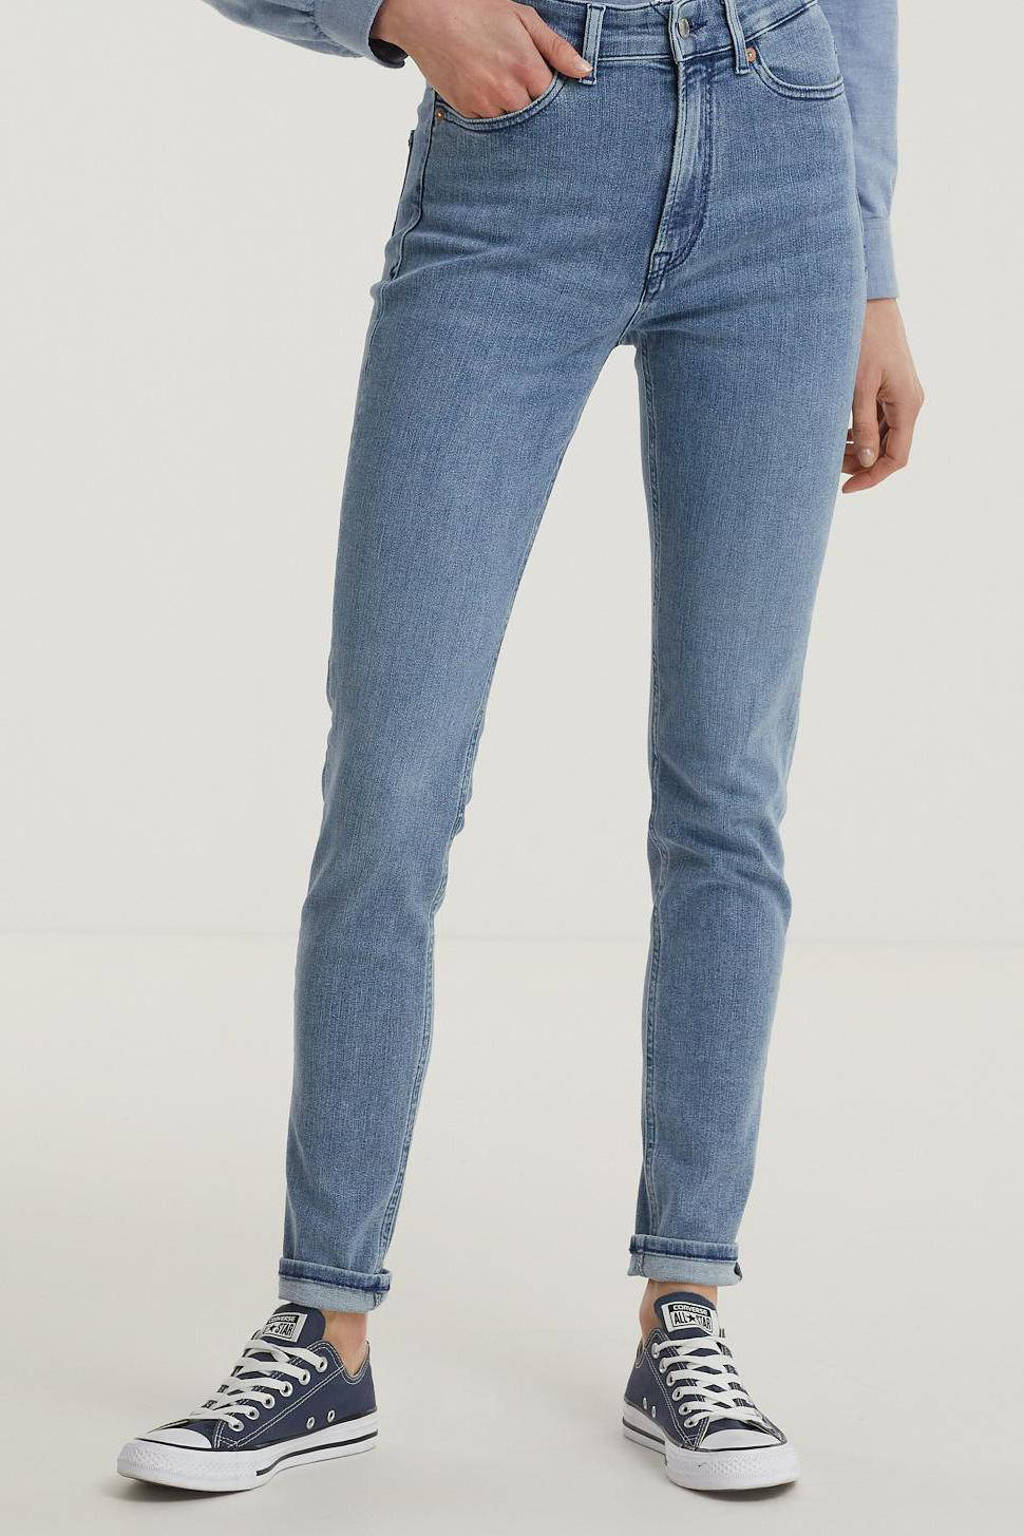 Kings of Indigo high waist skinny jeans CHRISTINA HIGH met biologisch katoen 5027 eco myla light used, 5027 ECO MYLA LIGHT USED